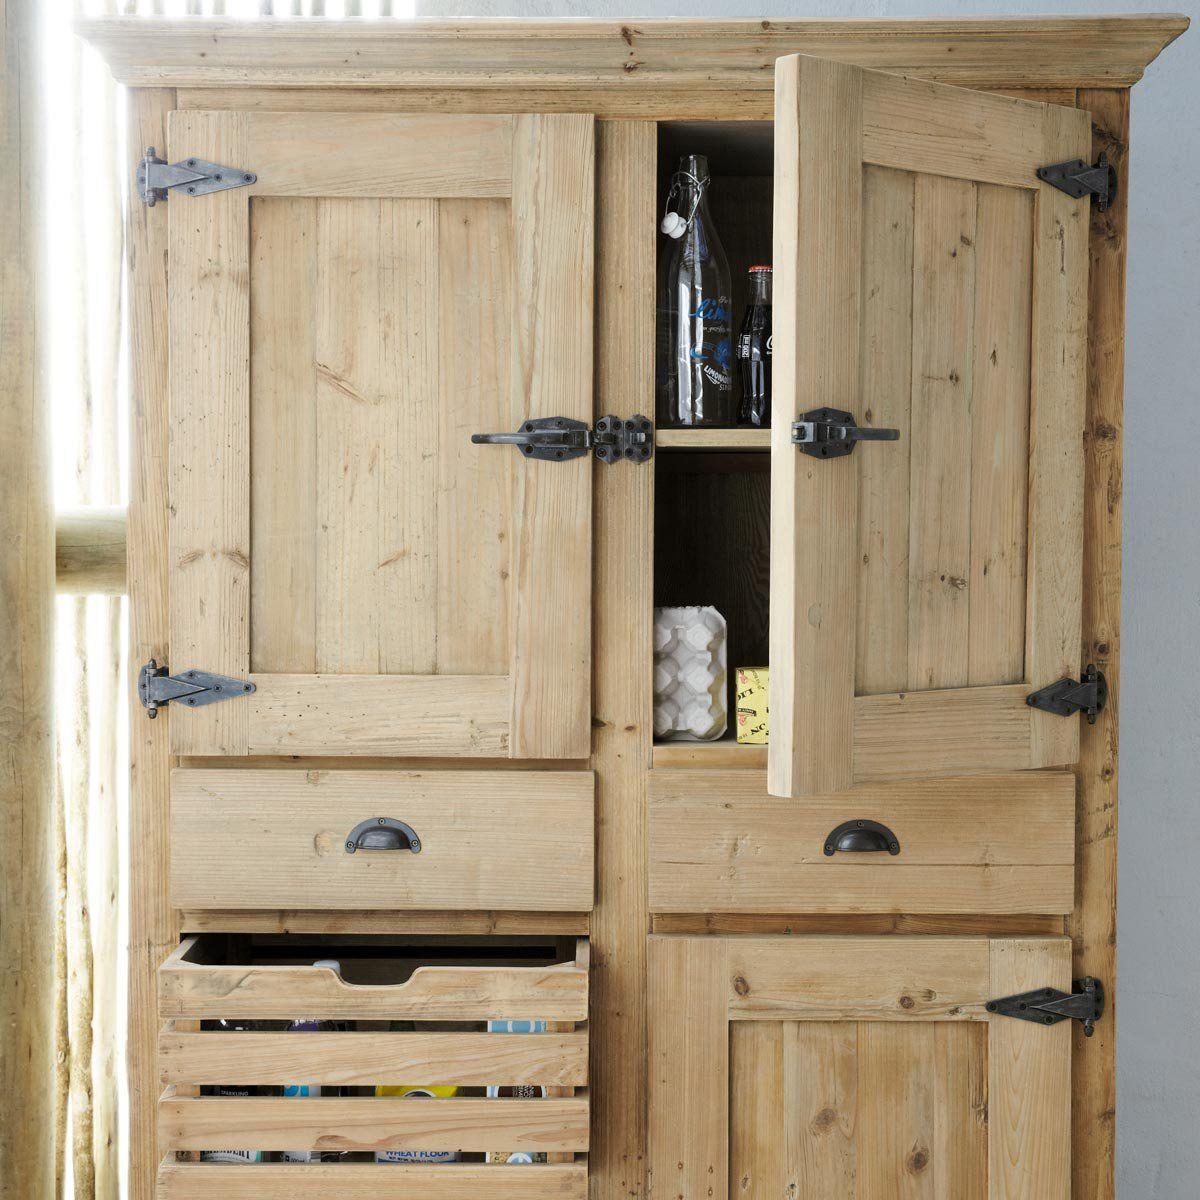 Alacena de madera reciclada pagnol mr pickwick - Alacena de madera ...